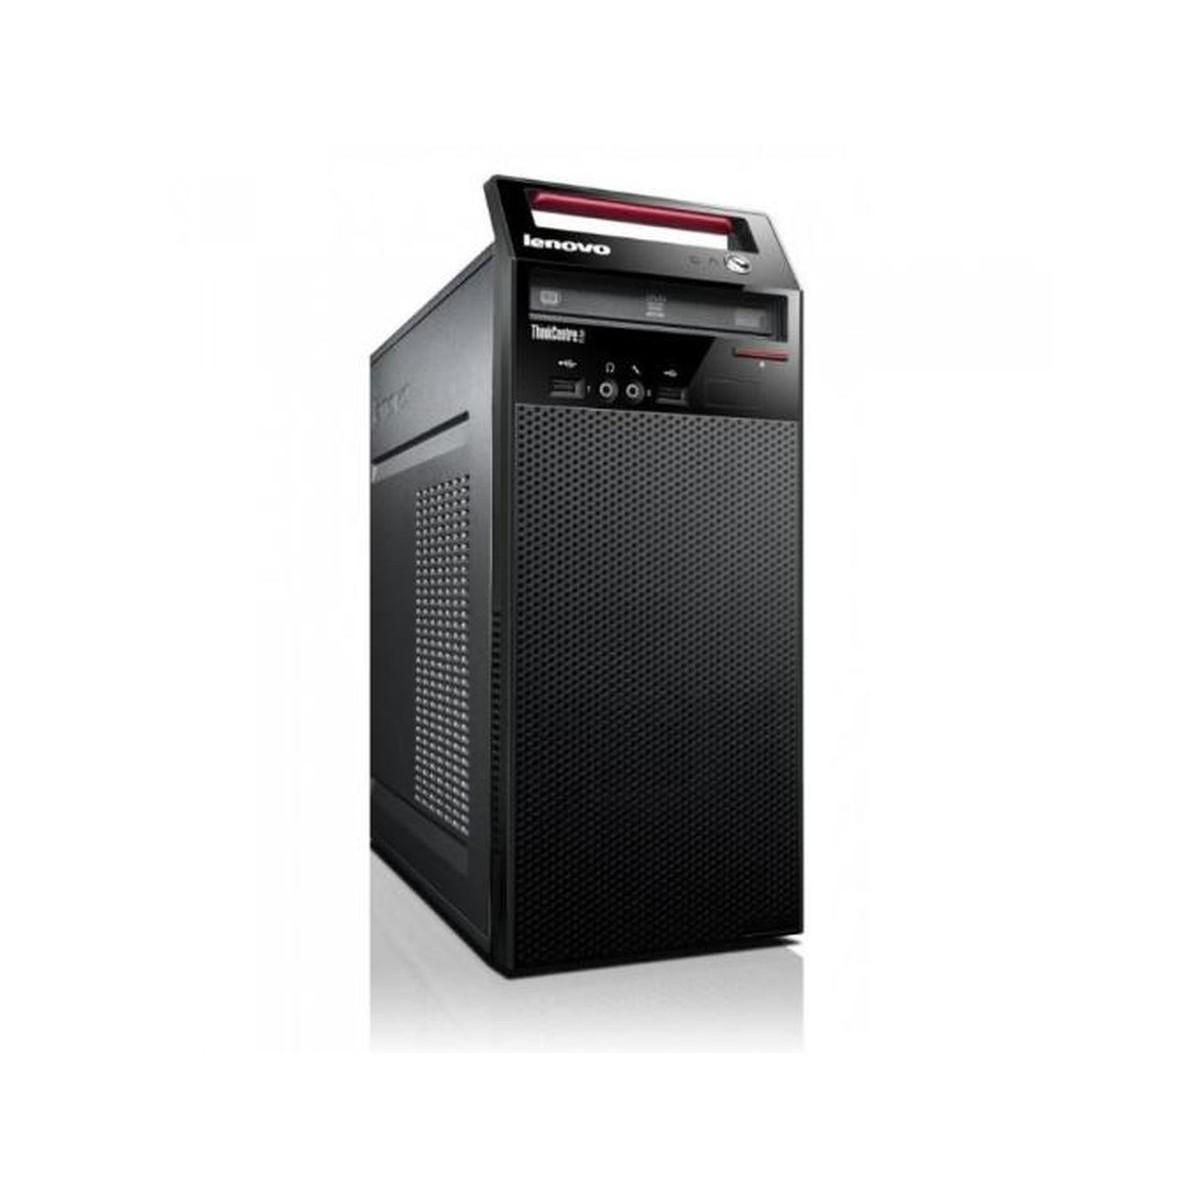 LENOVO EDGE 73 G3220 4GB 500GB SATA WIN10